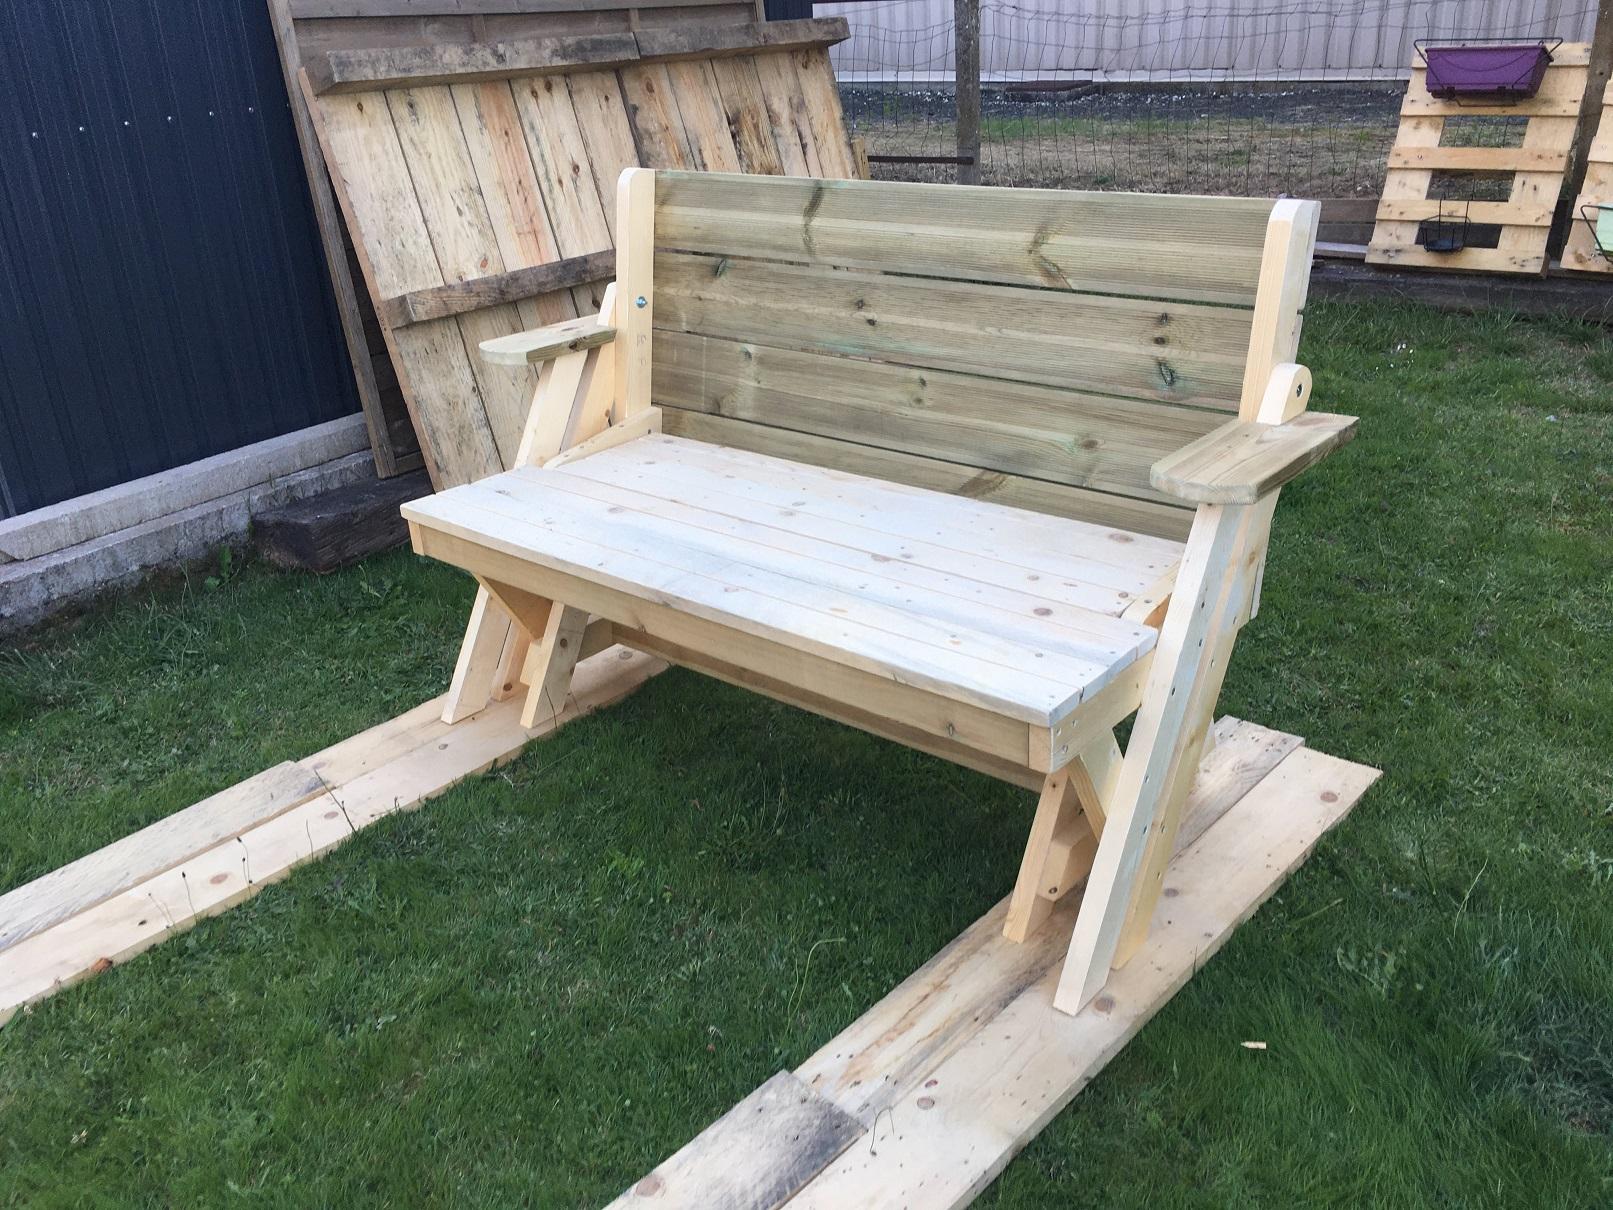 J'ai construit un banc transformable en table de pique nique